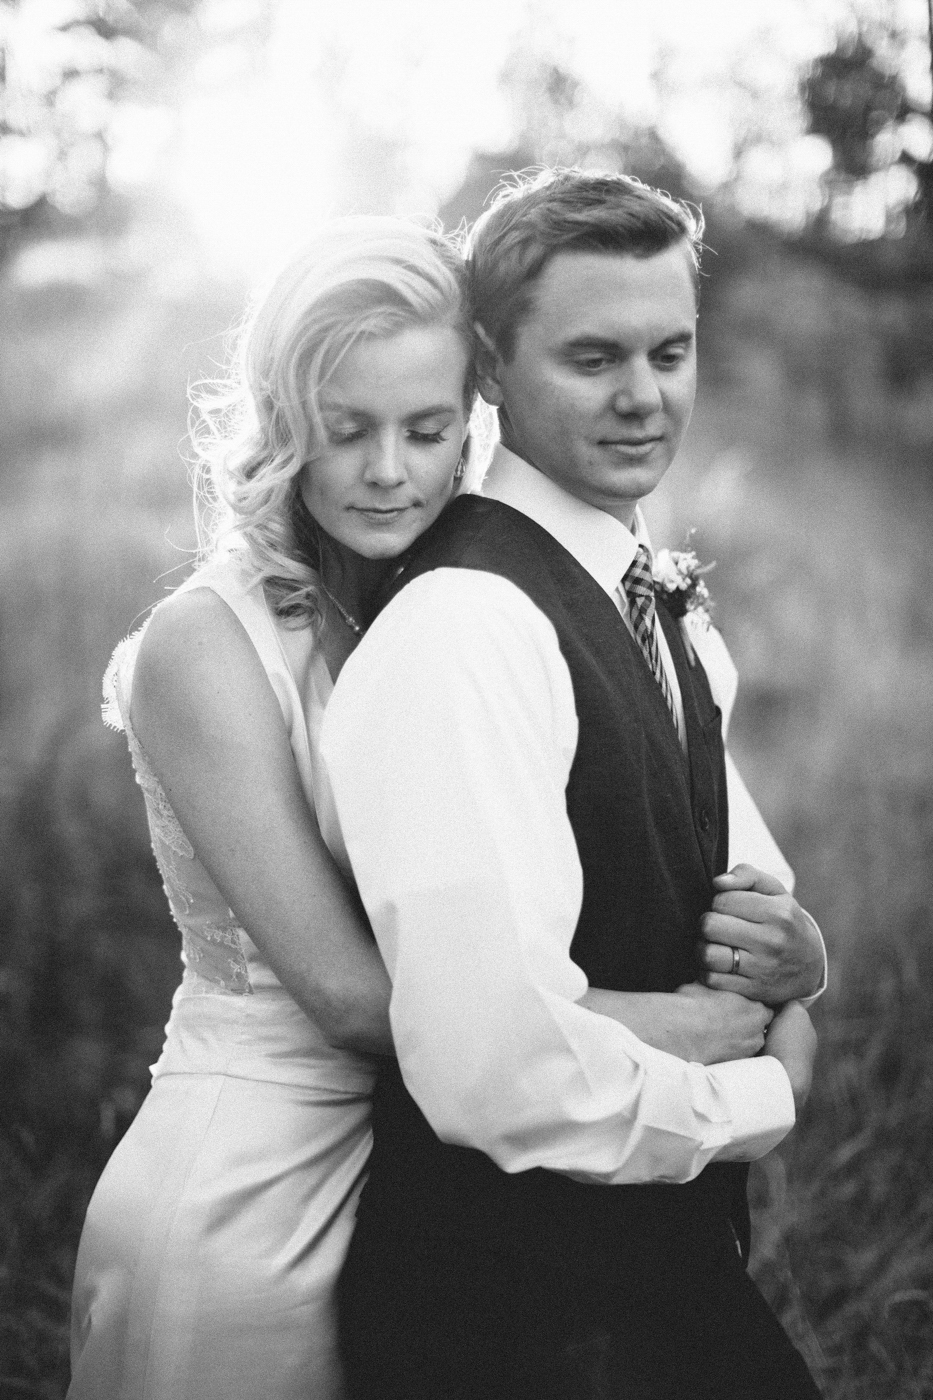 SouthDakota-Iowa-Destination-Wedding-Photographer_109.jpg